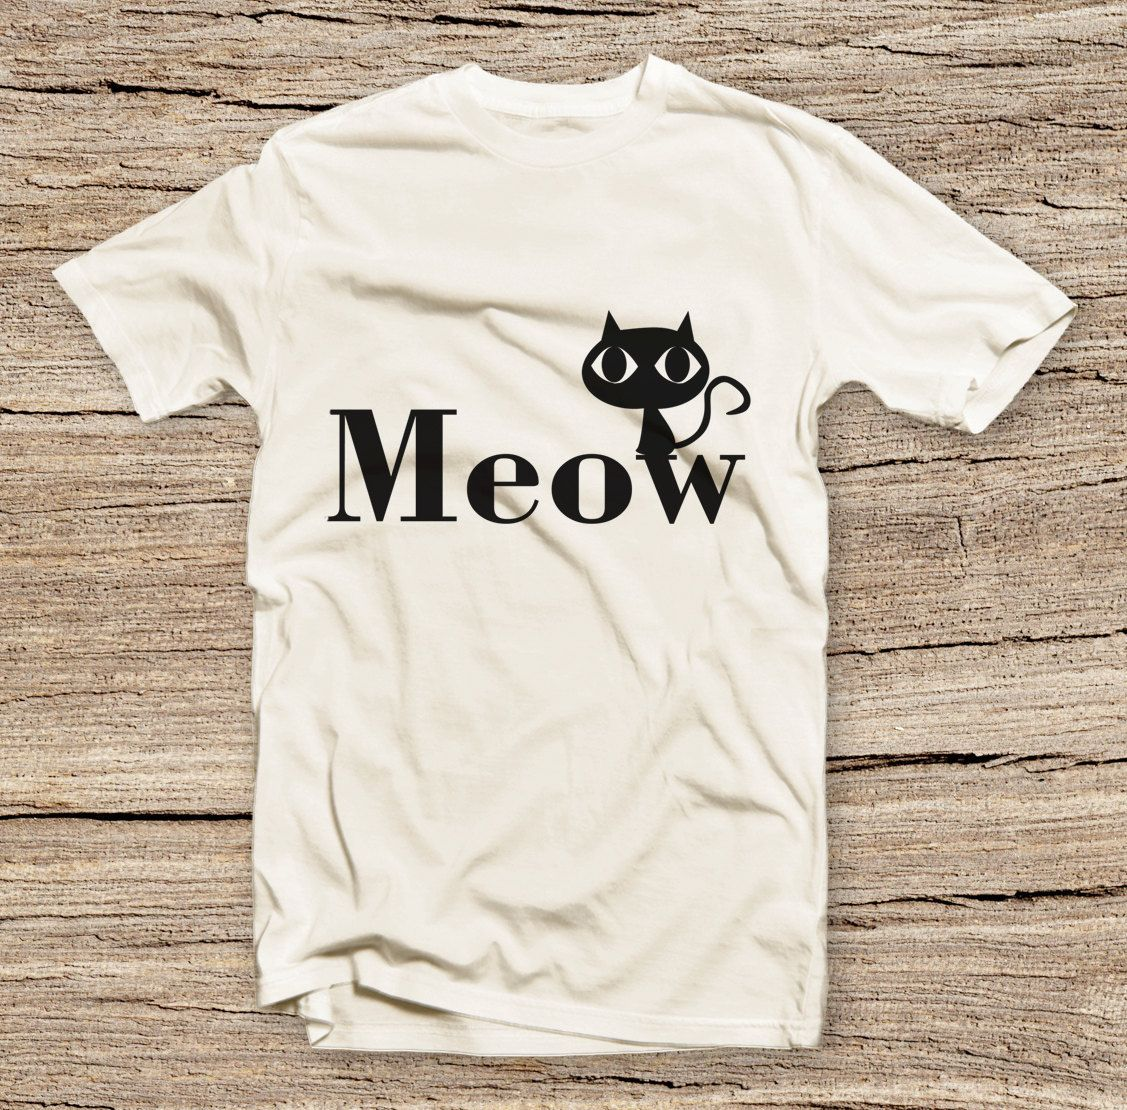 PTS 031 Meow T shirt Cute Cat T shirt Fashion Style Printed T